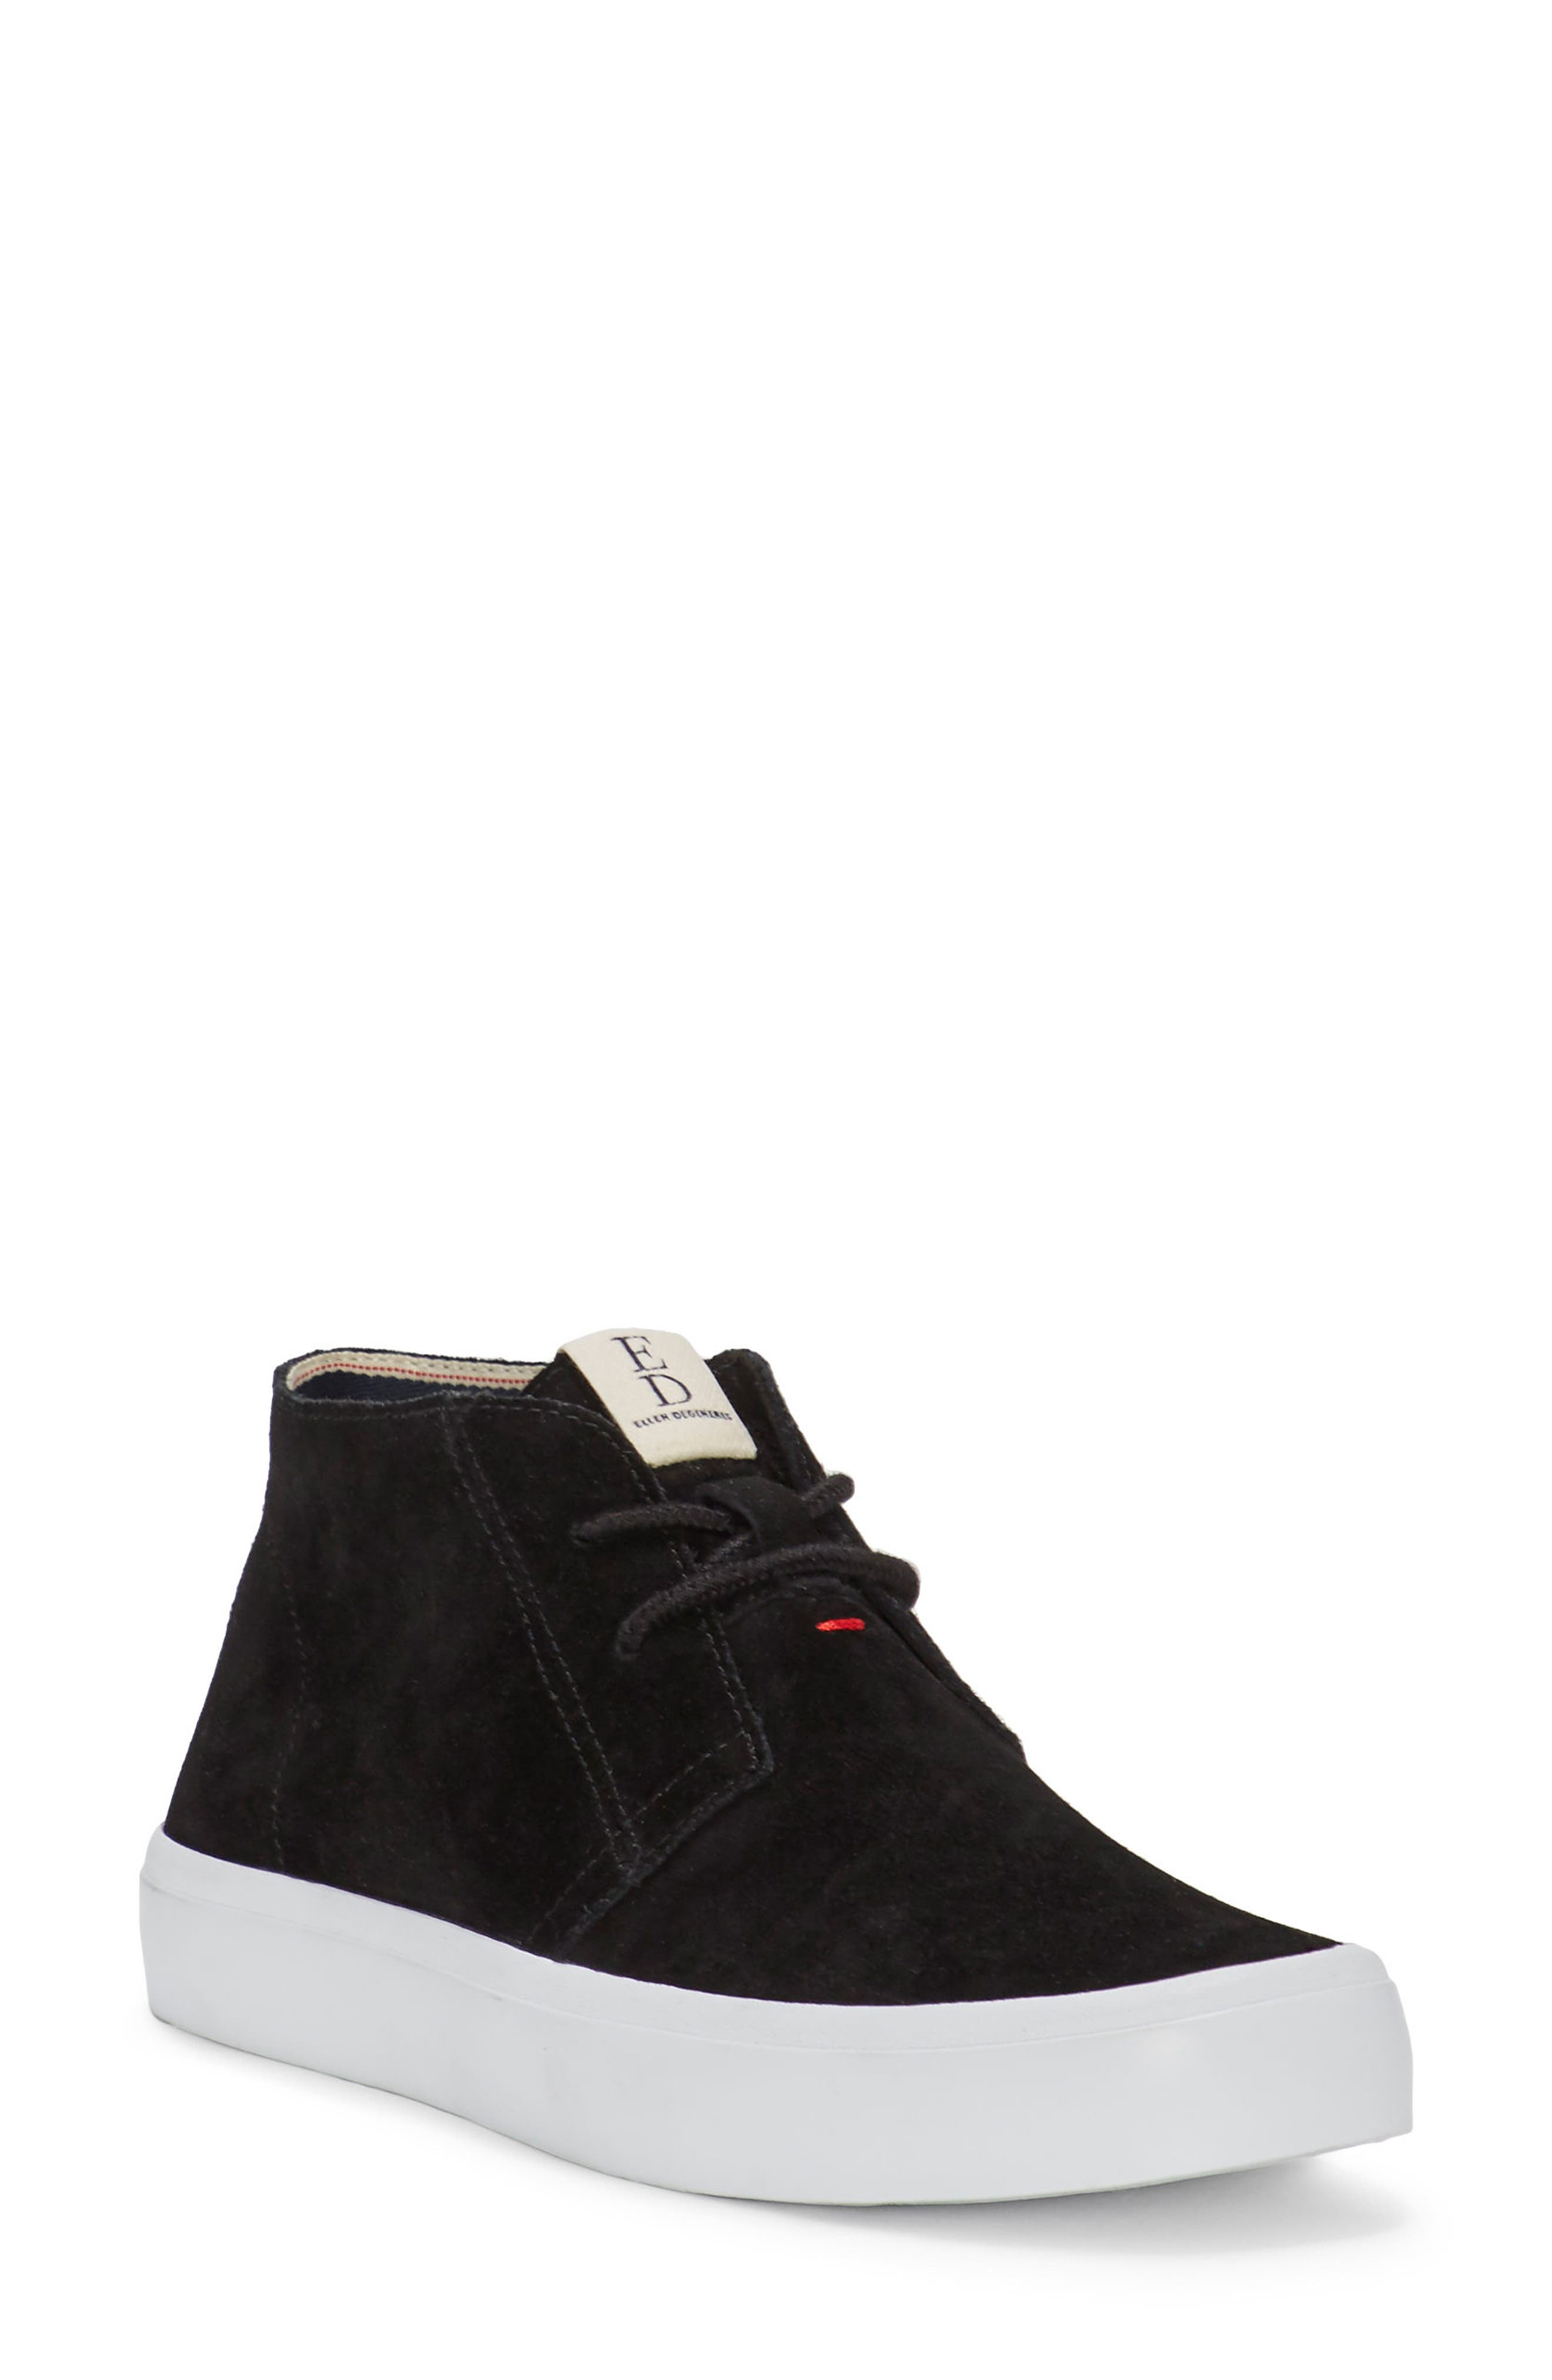 Dax Chukka Sneaker,                             Main thumbnail 1, color,                             002